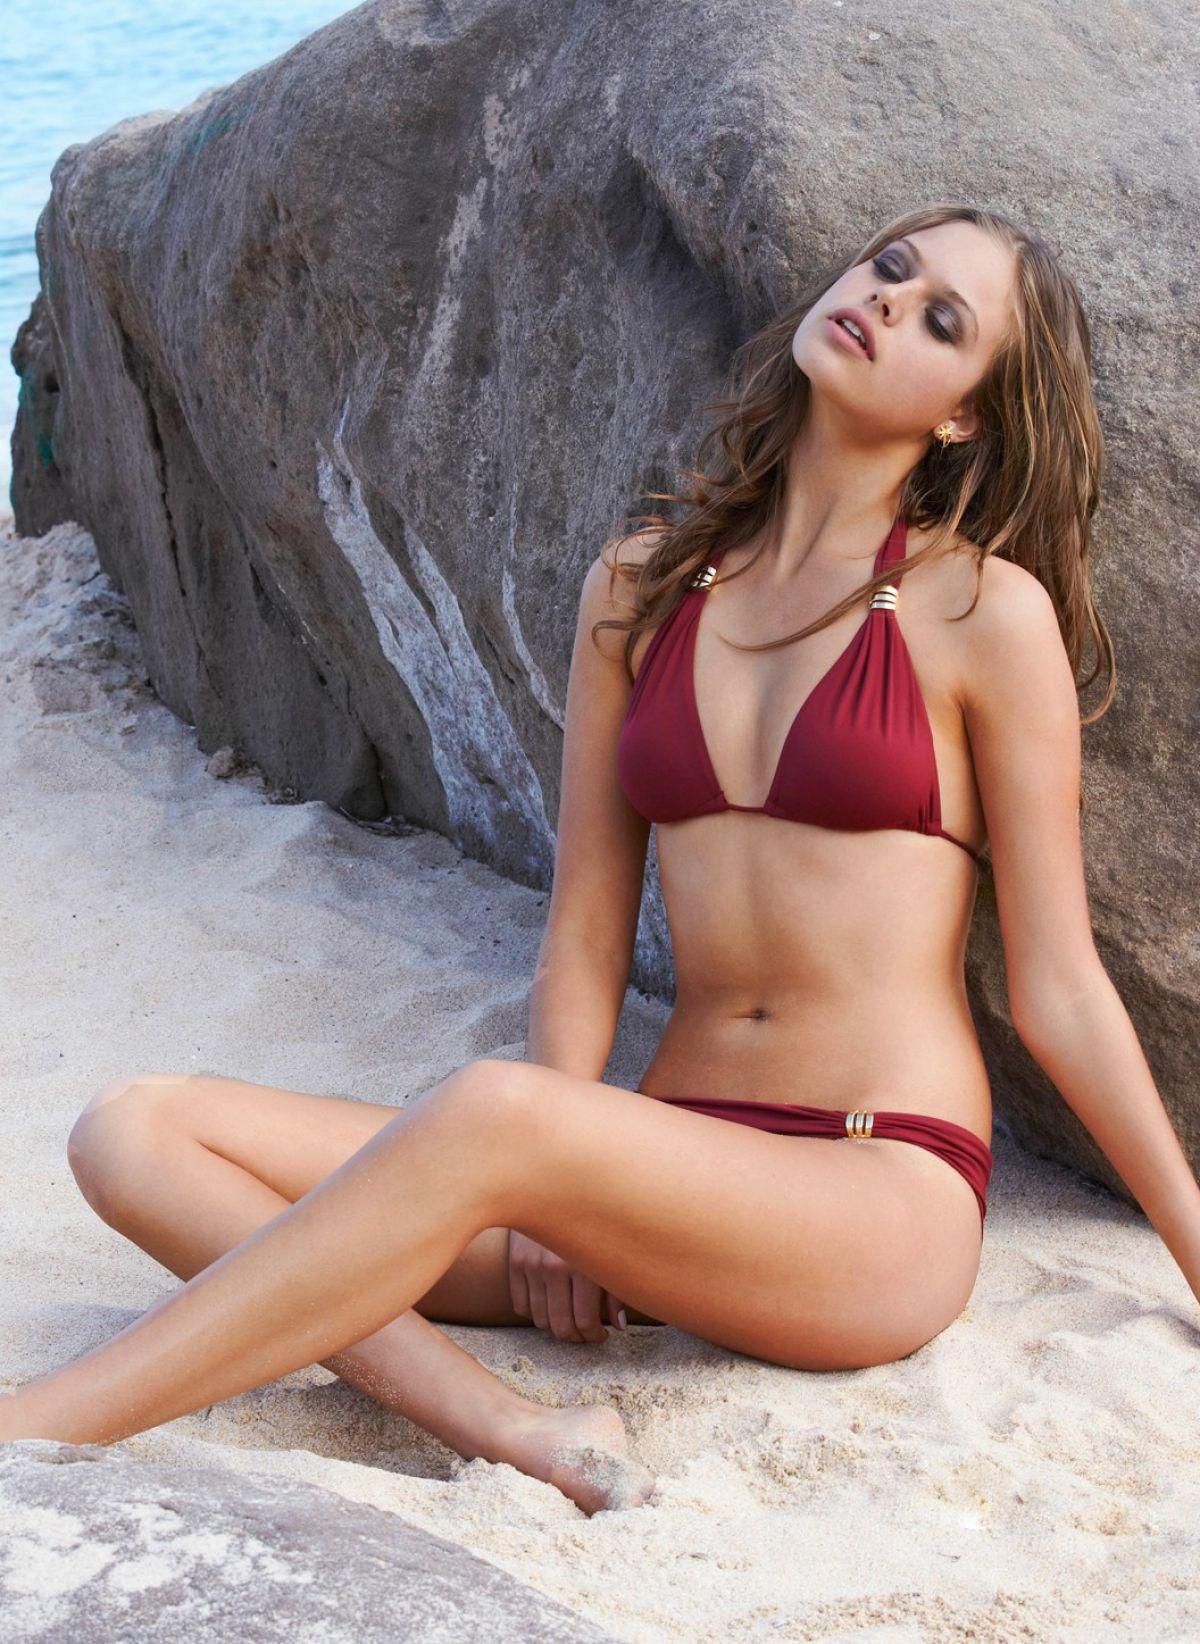 Bikini Melissa Clarke nudes (79 photos), Tits, Cleavage, Selfie, butt 2020